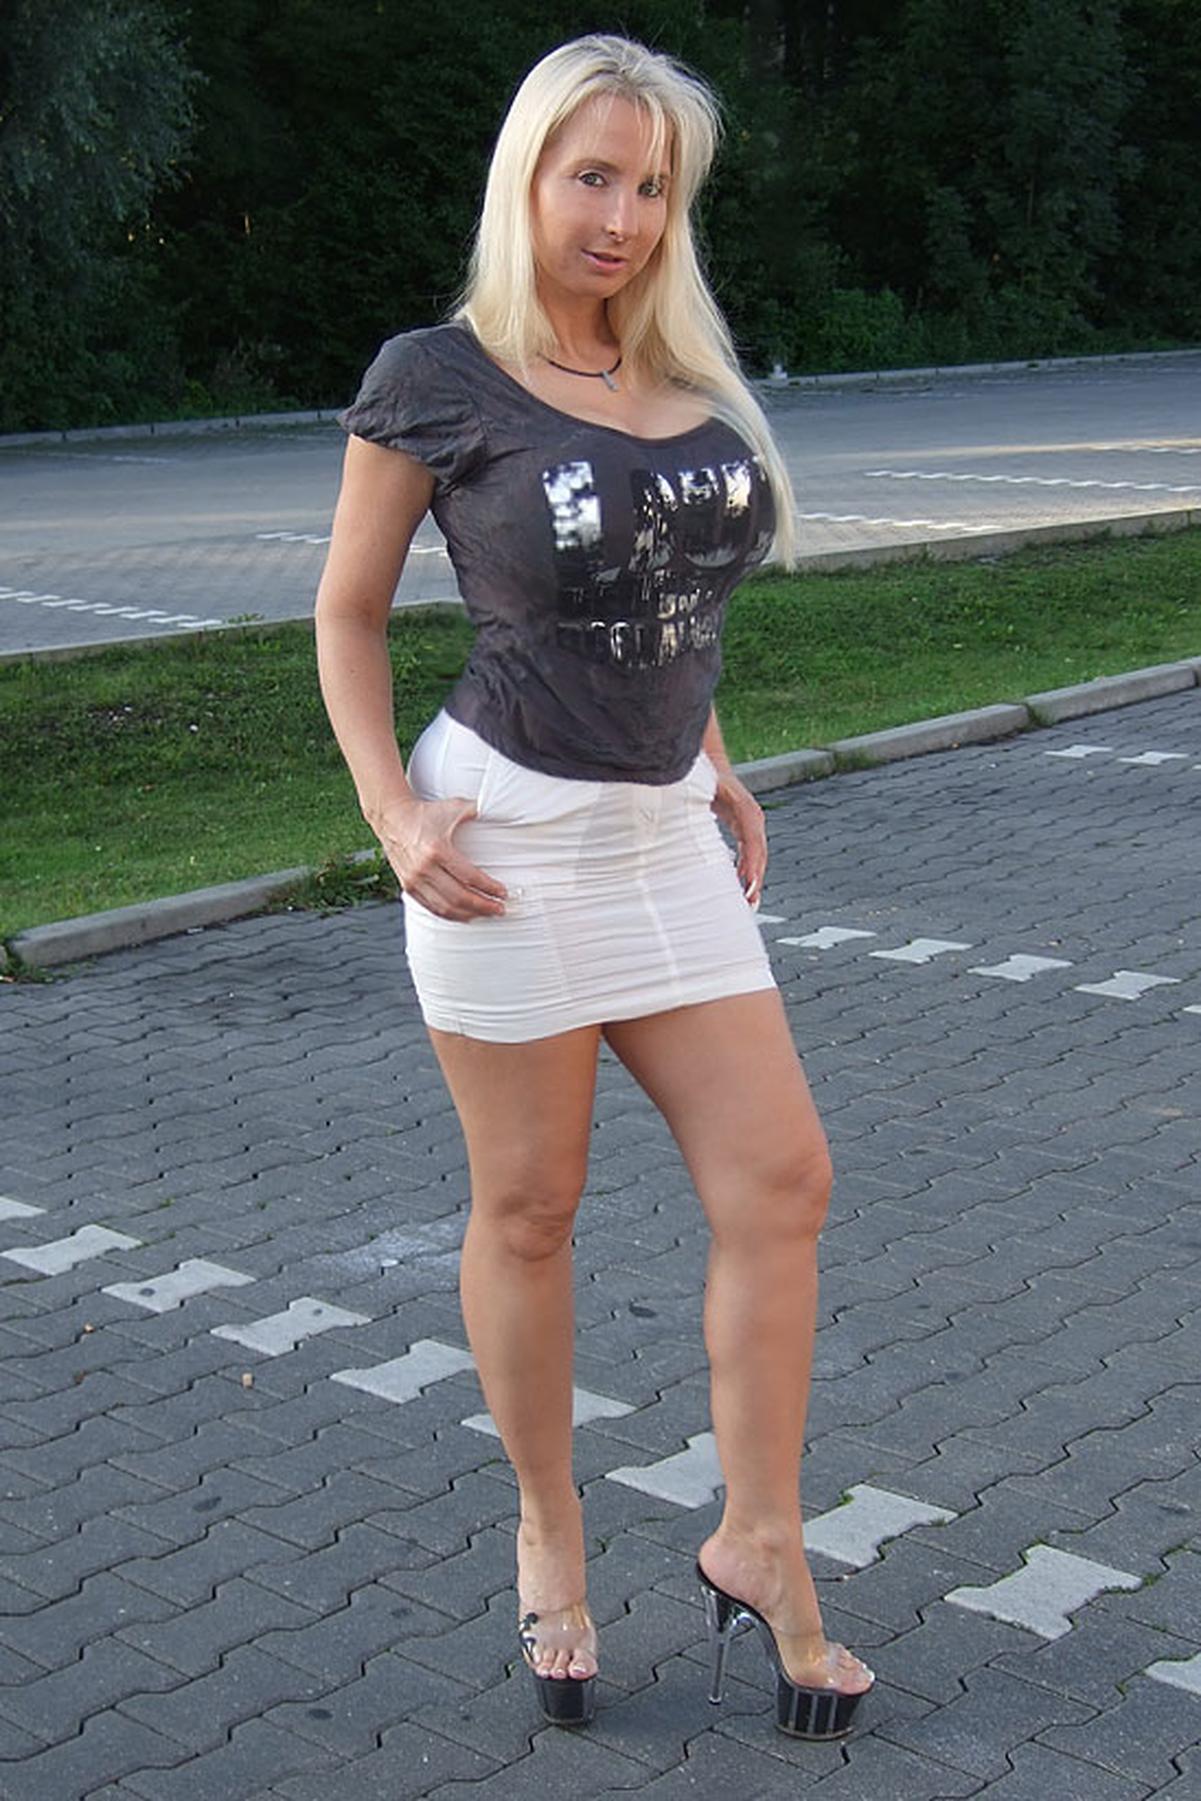 Vanessa Montagne Wiki & Bio - Pornographic Actress